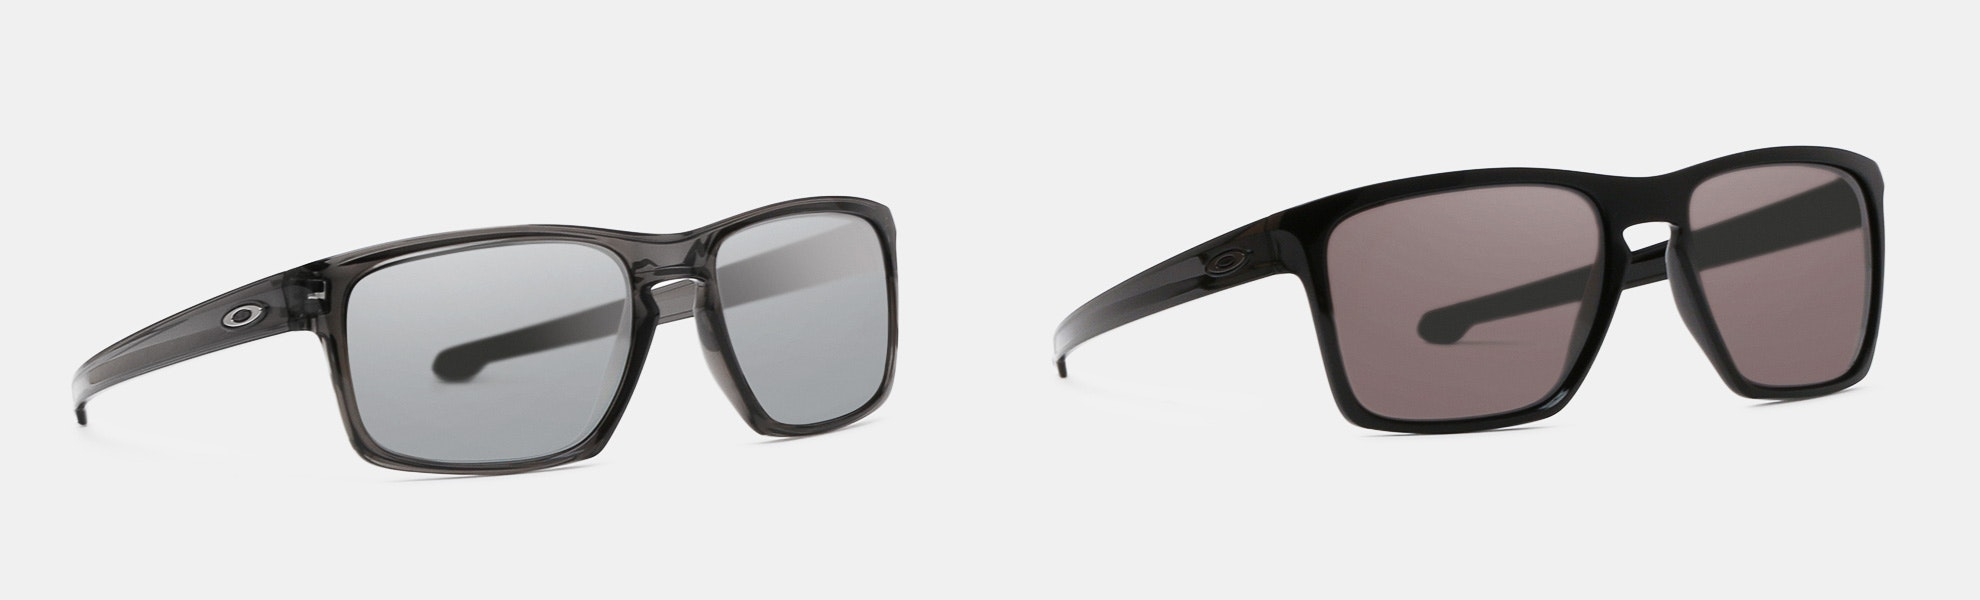 Oakley Sliver & Sliver XL Polarized Sunglasses